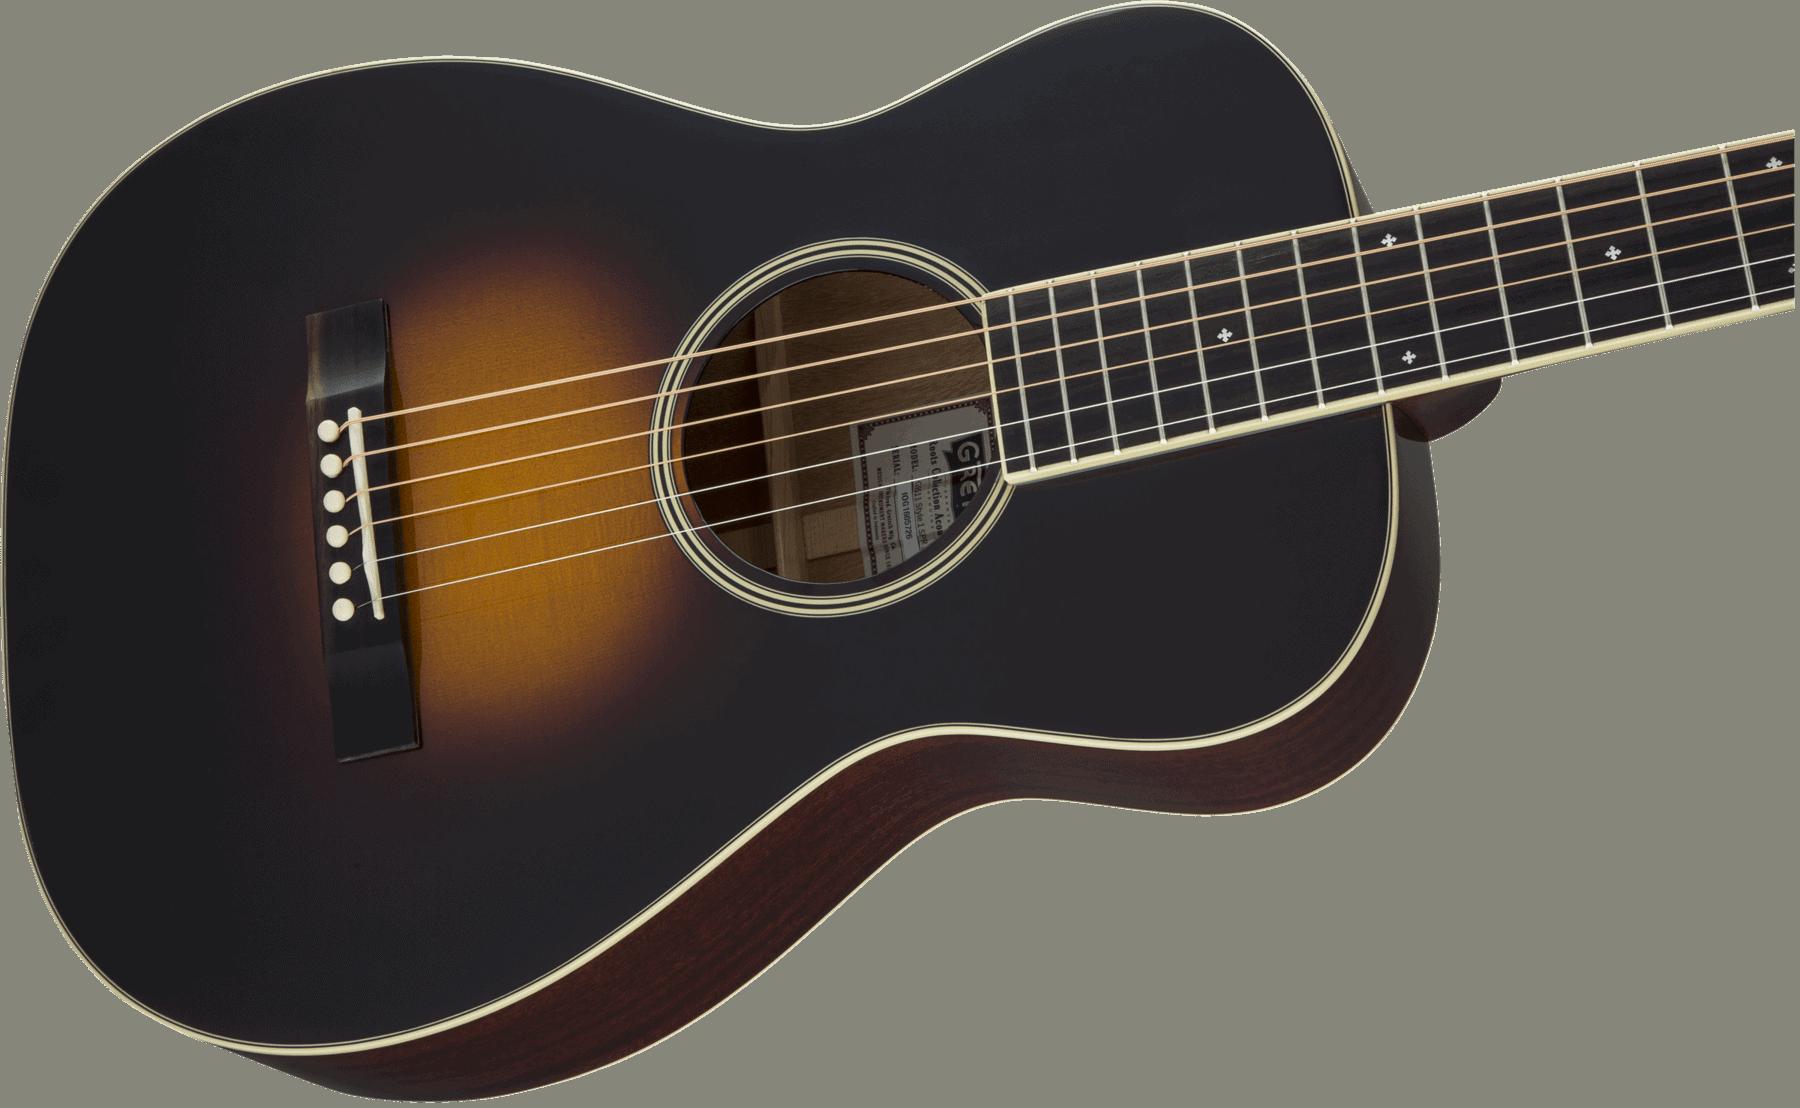 Gretsch Acoustic Guitars >> Gretsch G9511 Style 1 Single 0 Parlour Acoustic Guitar Appalachi Cloudburst